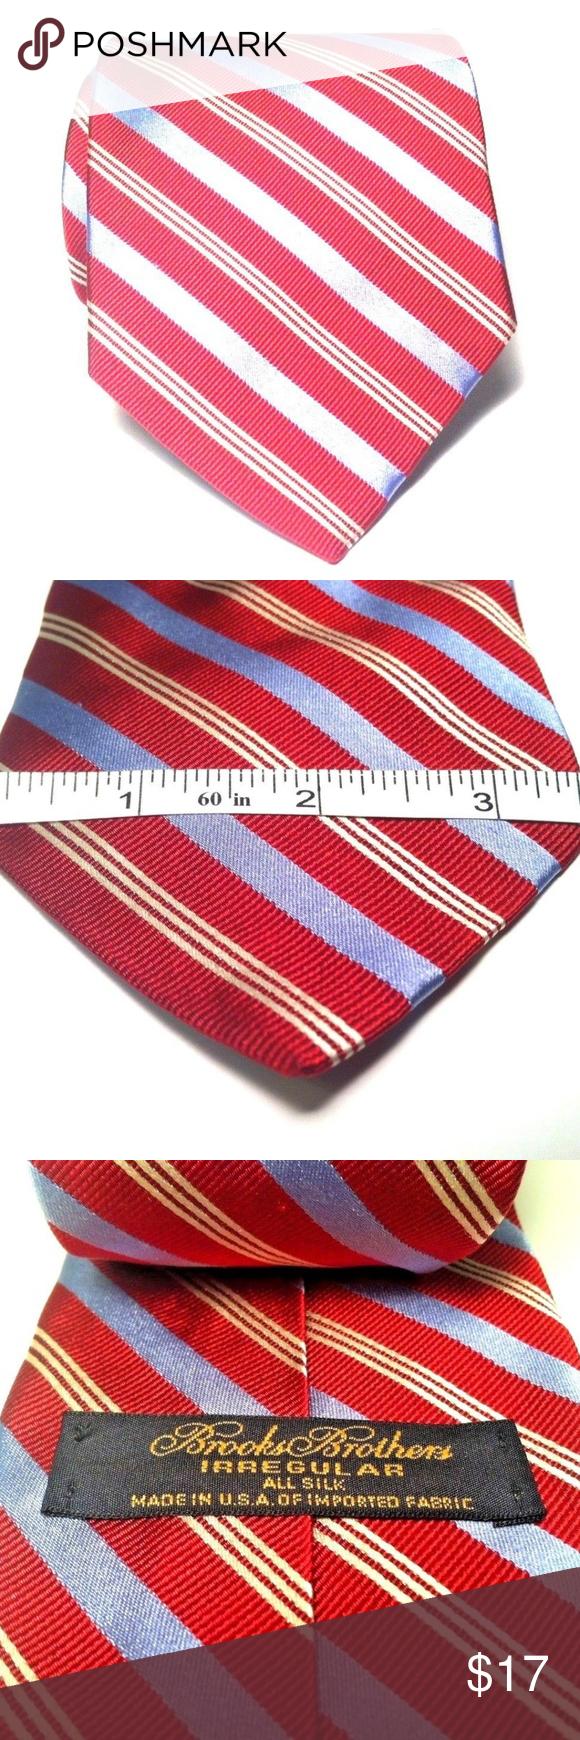 0ca6e10b1602 Brooks Brothers Makers Mens Tie Necktie Irregular Brooks Brothers Makers Men's  Tie 100% Silk Irregular Striped Necktie 60